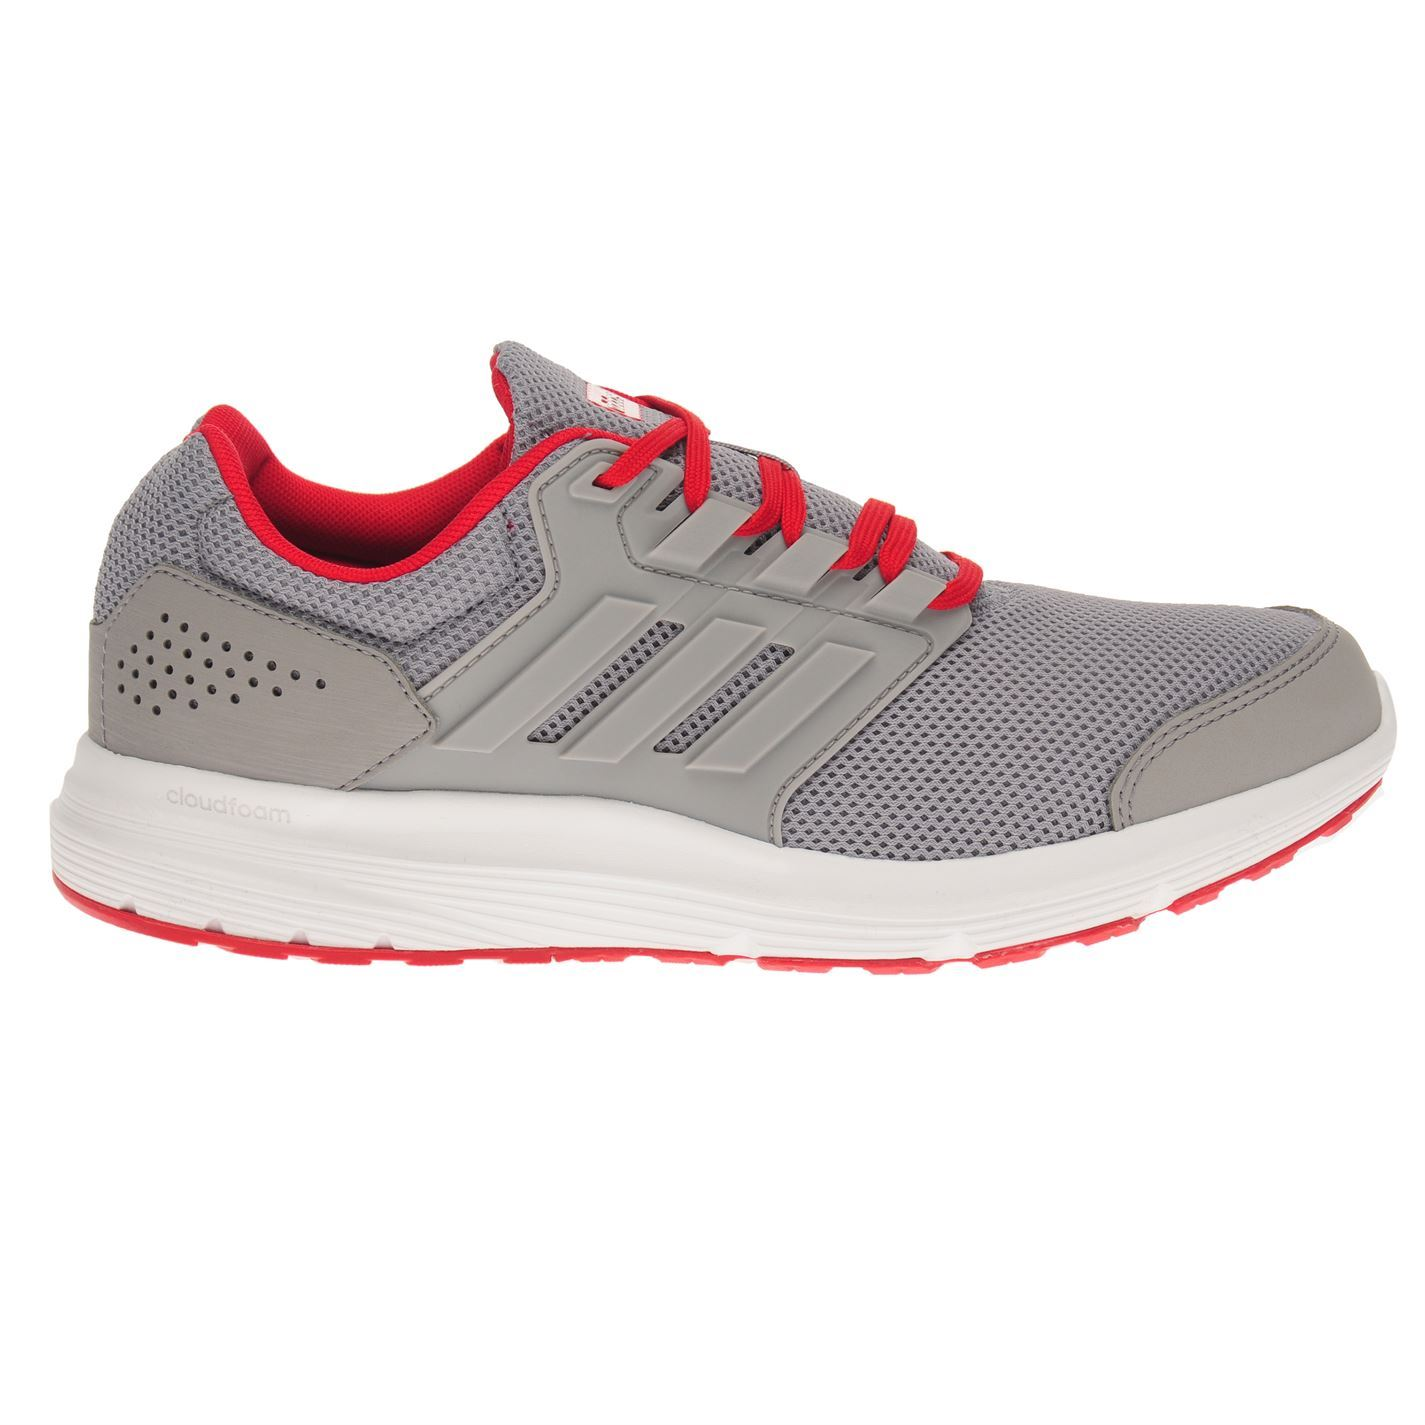 Running Galaxy 4 De Zapatillas Shoes Hombre Trote Fitness Adidas Detalles wPiTuZOkX